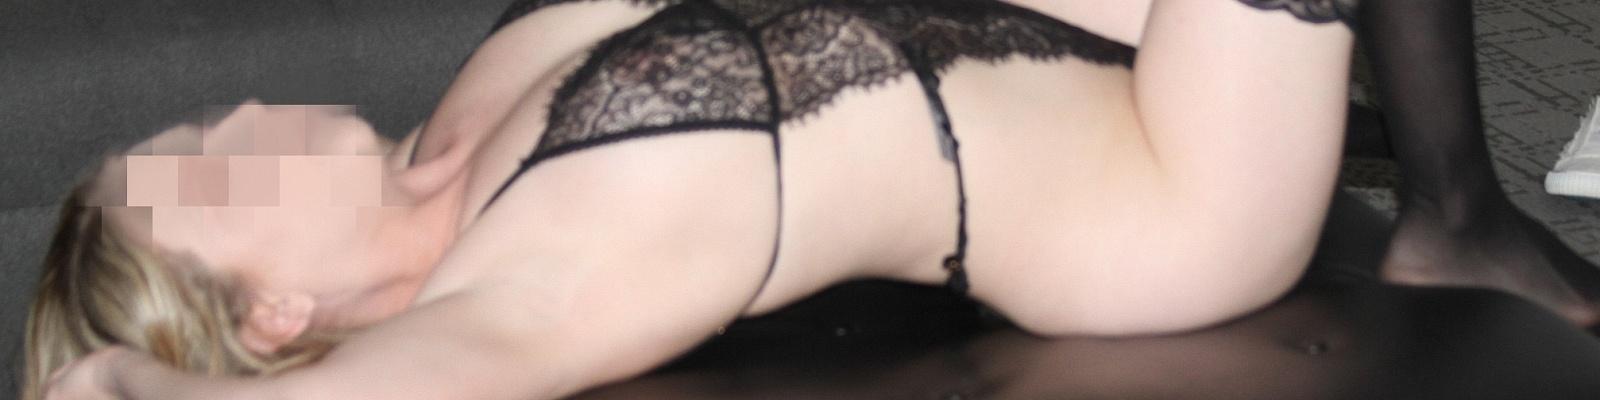 Chloe's Cover Photo